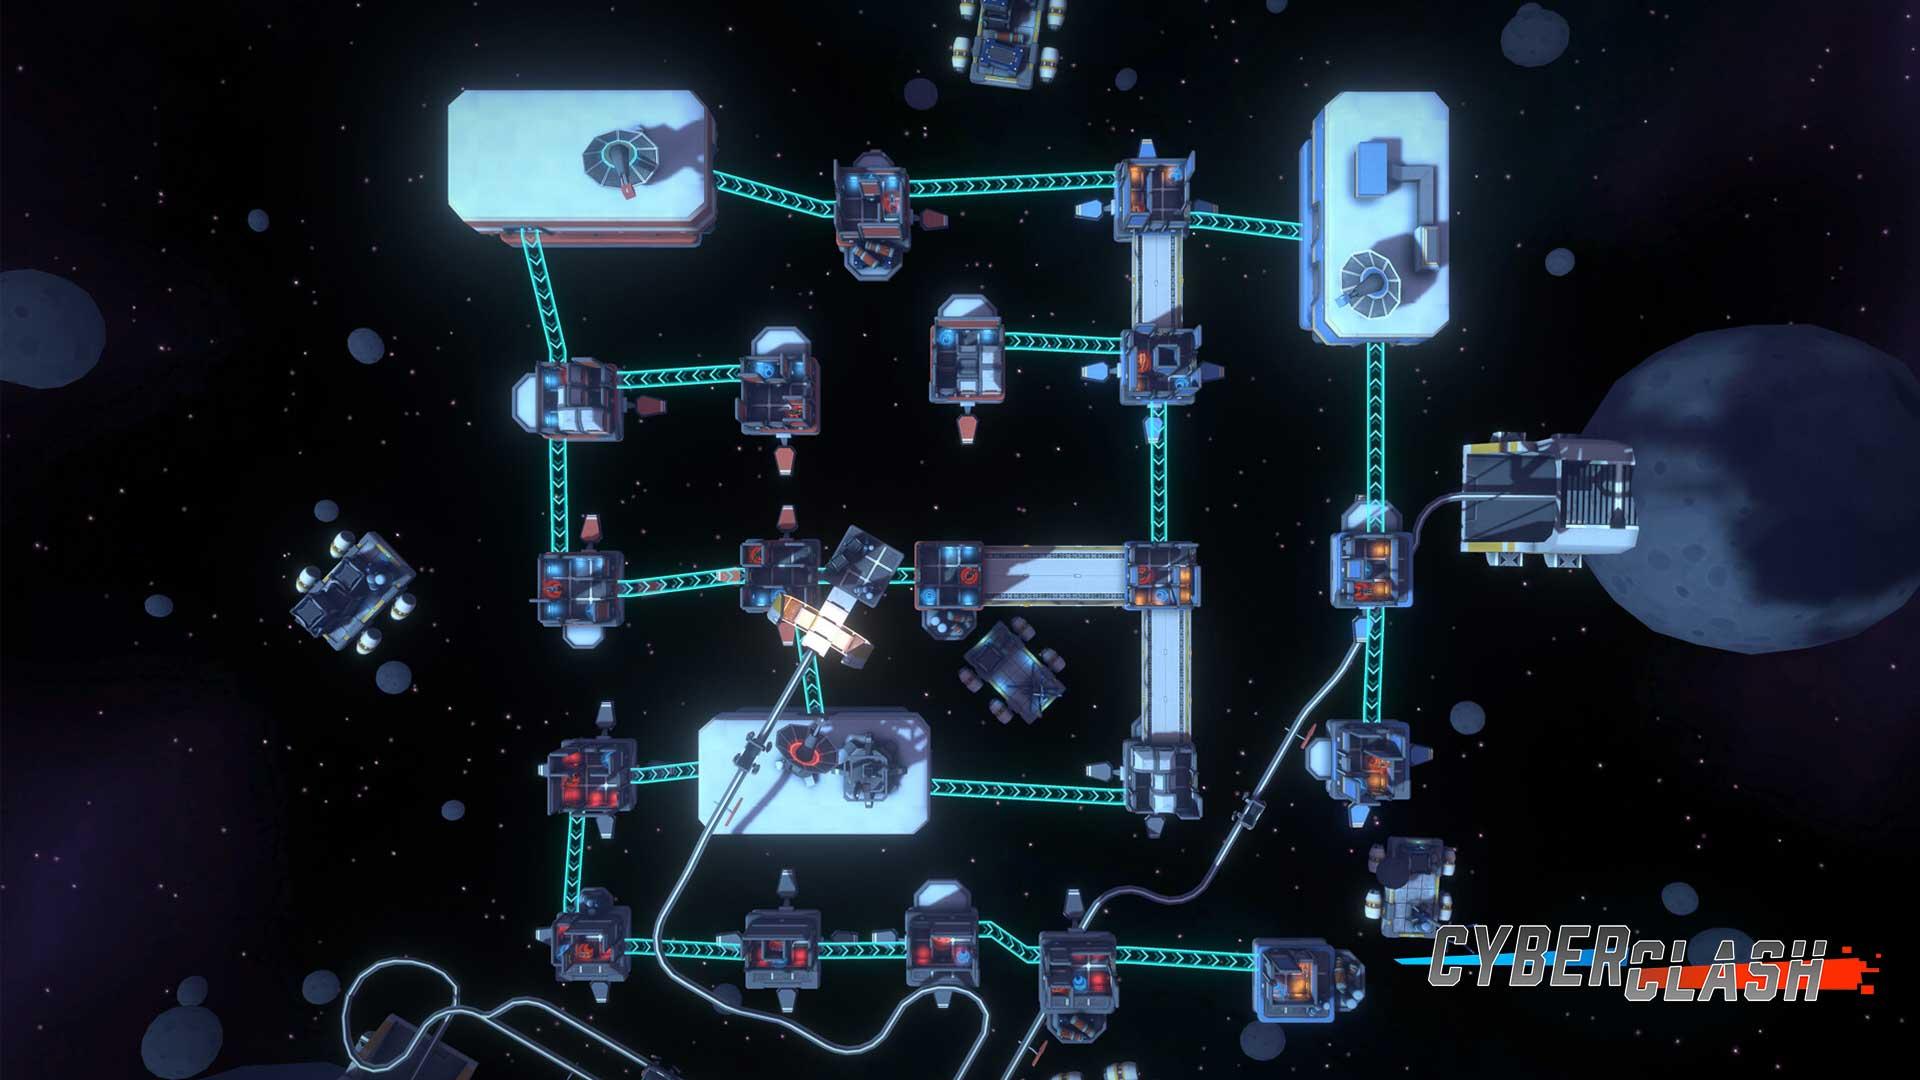 CyberClash_space11_web